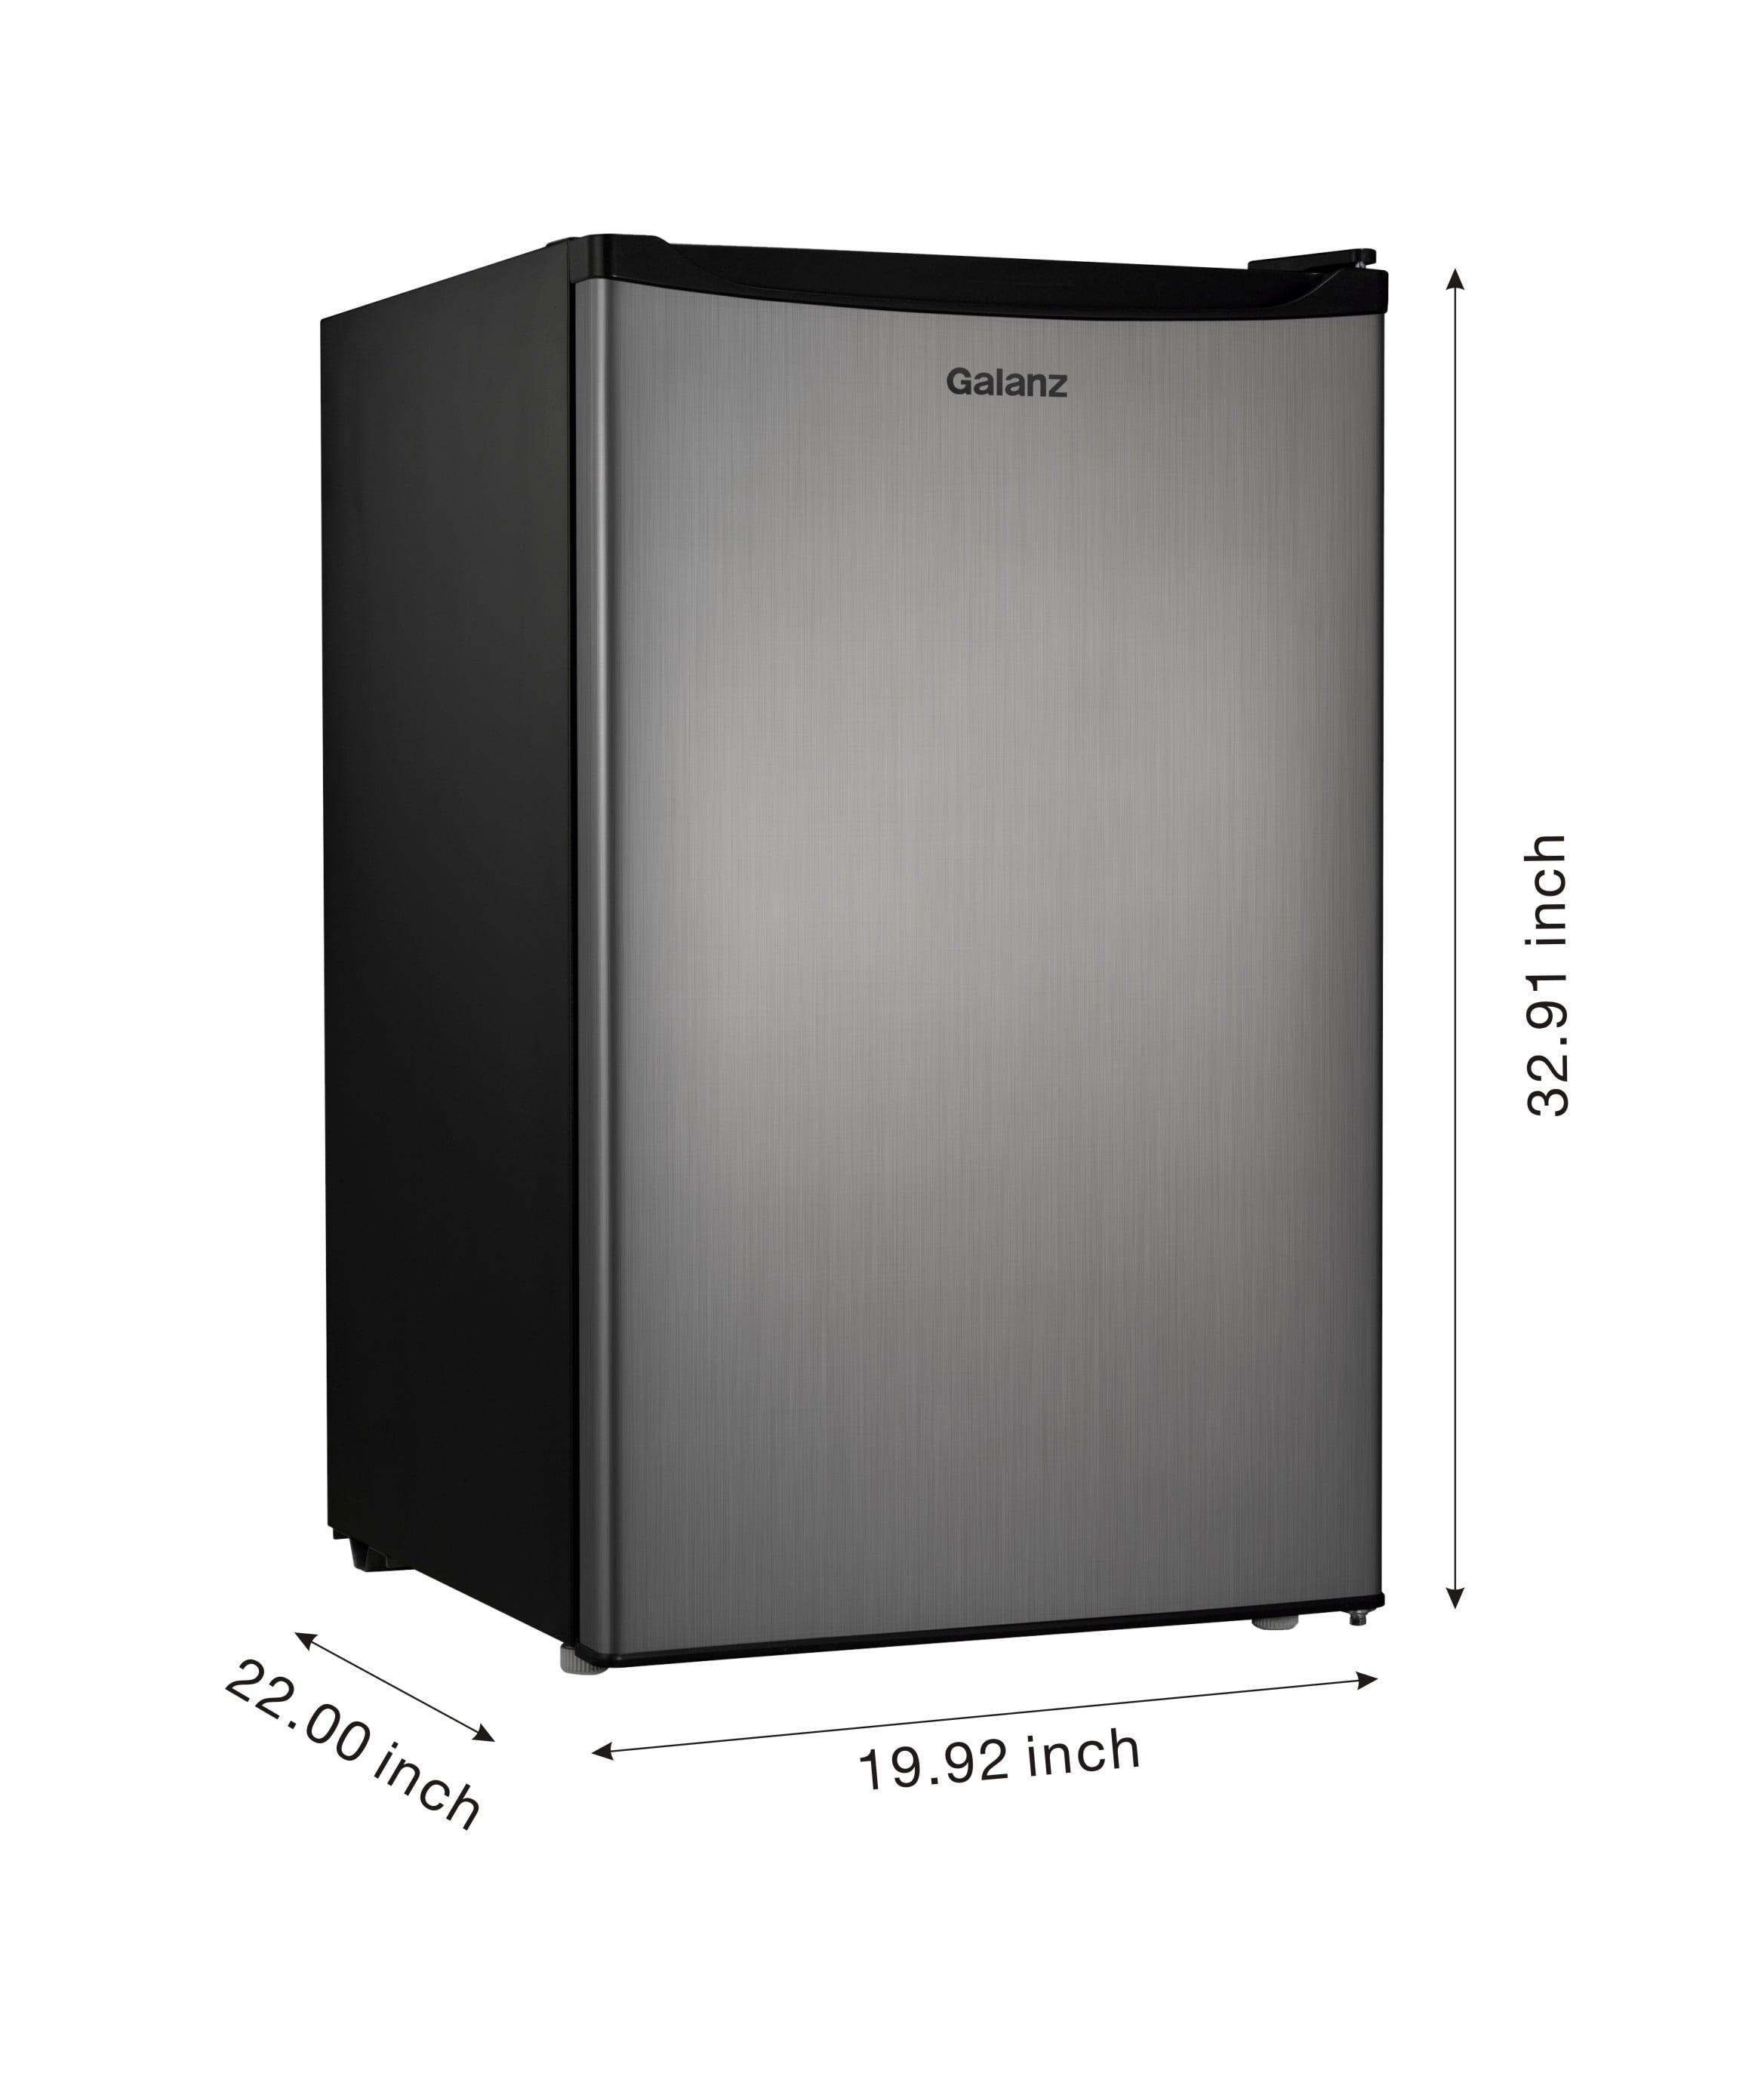 Galanz 4 3 Cu Ft Single Door Compact Refrigerator GL43S5